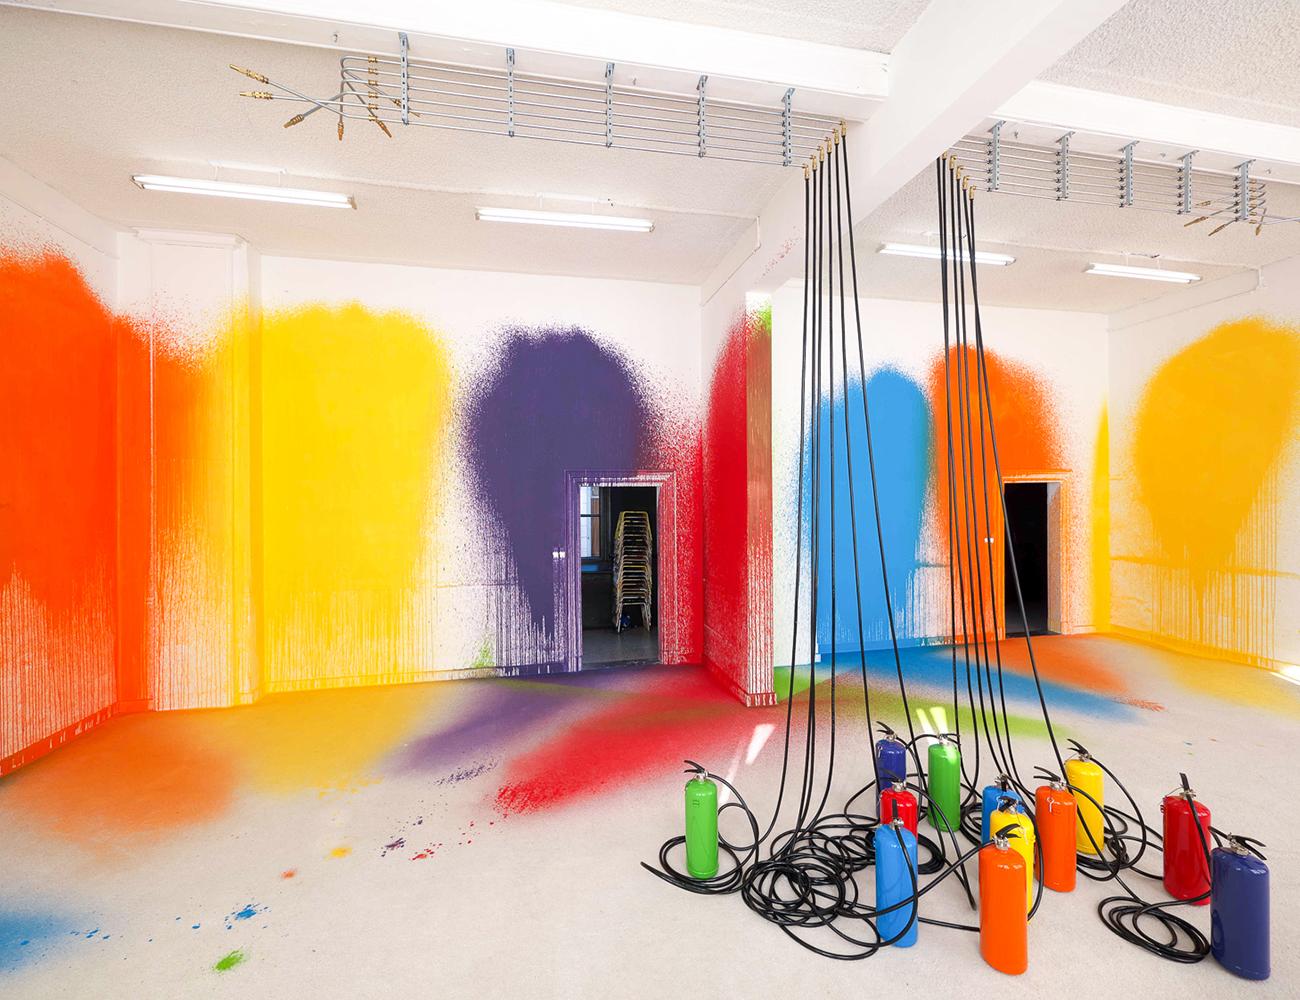 01 © Rutger de Vries, Color Disperser, 2019, Photo by Jan Tengbergen